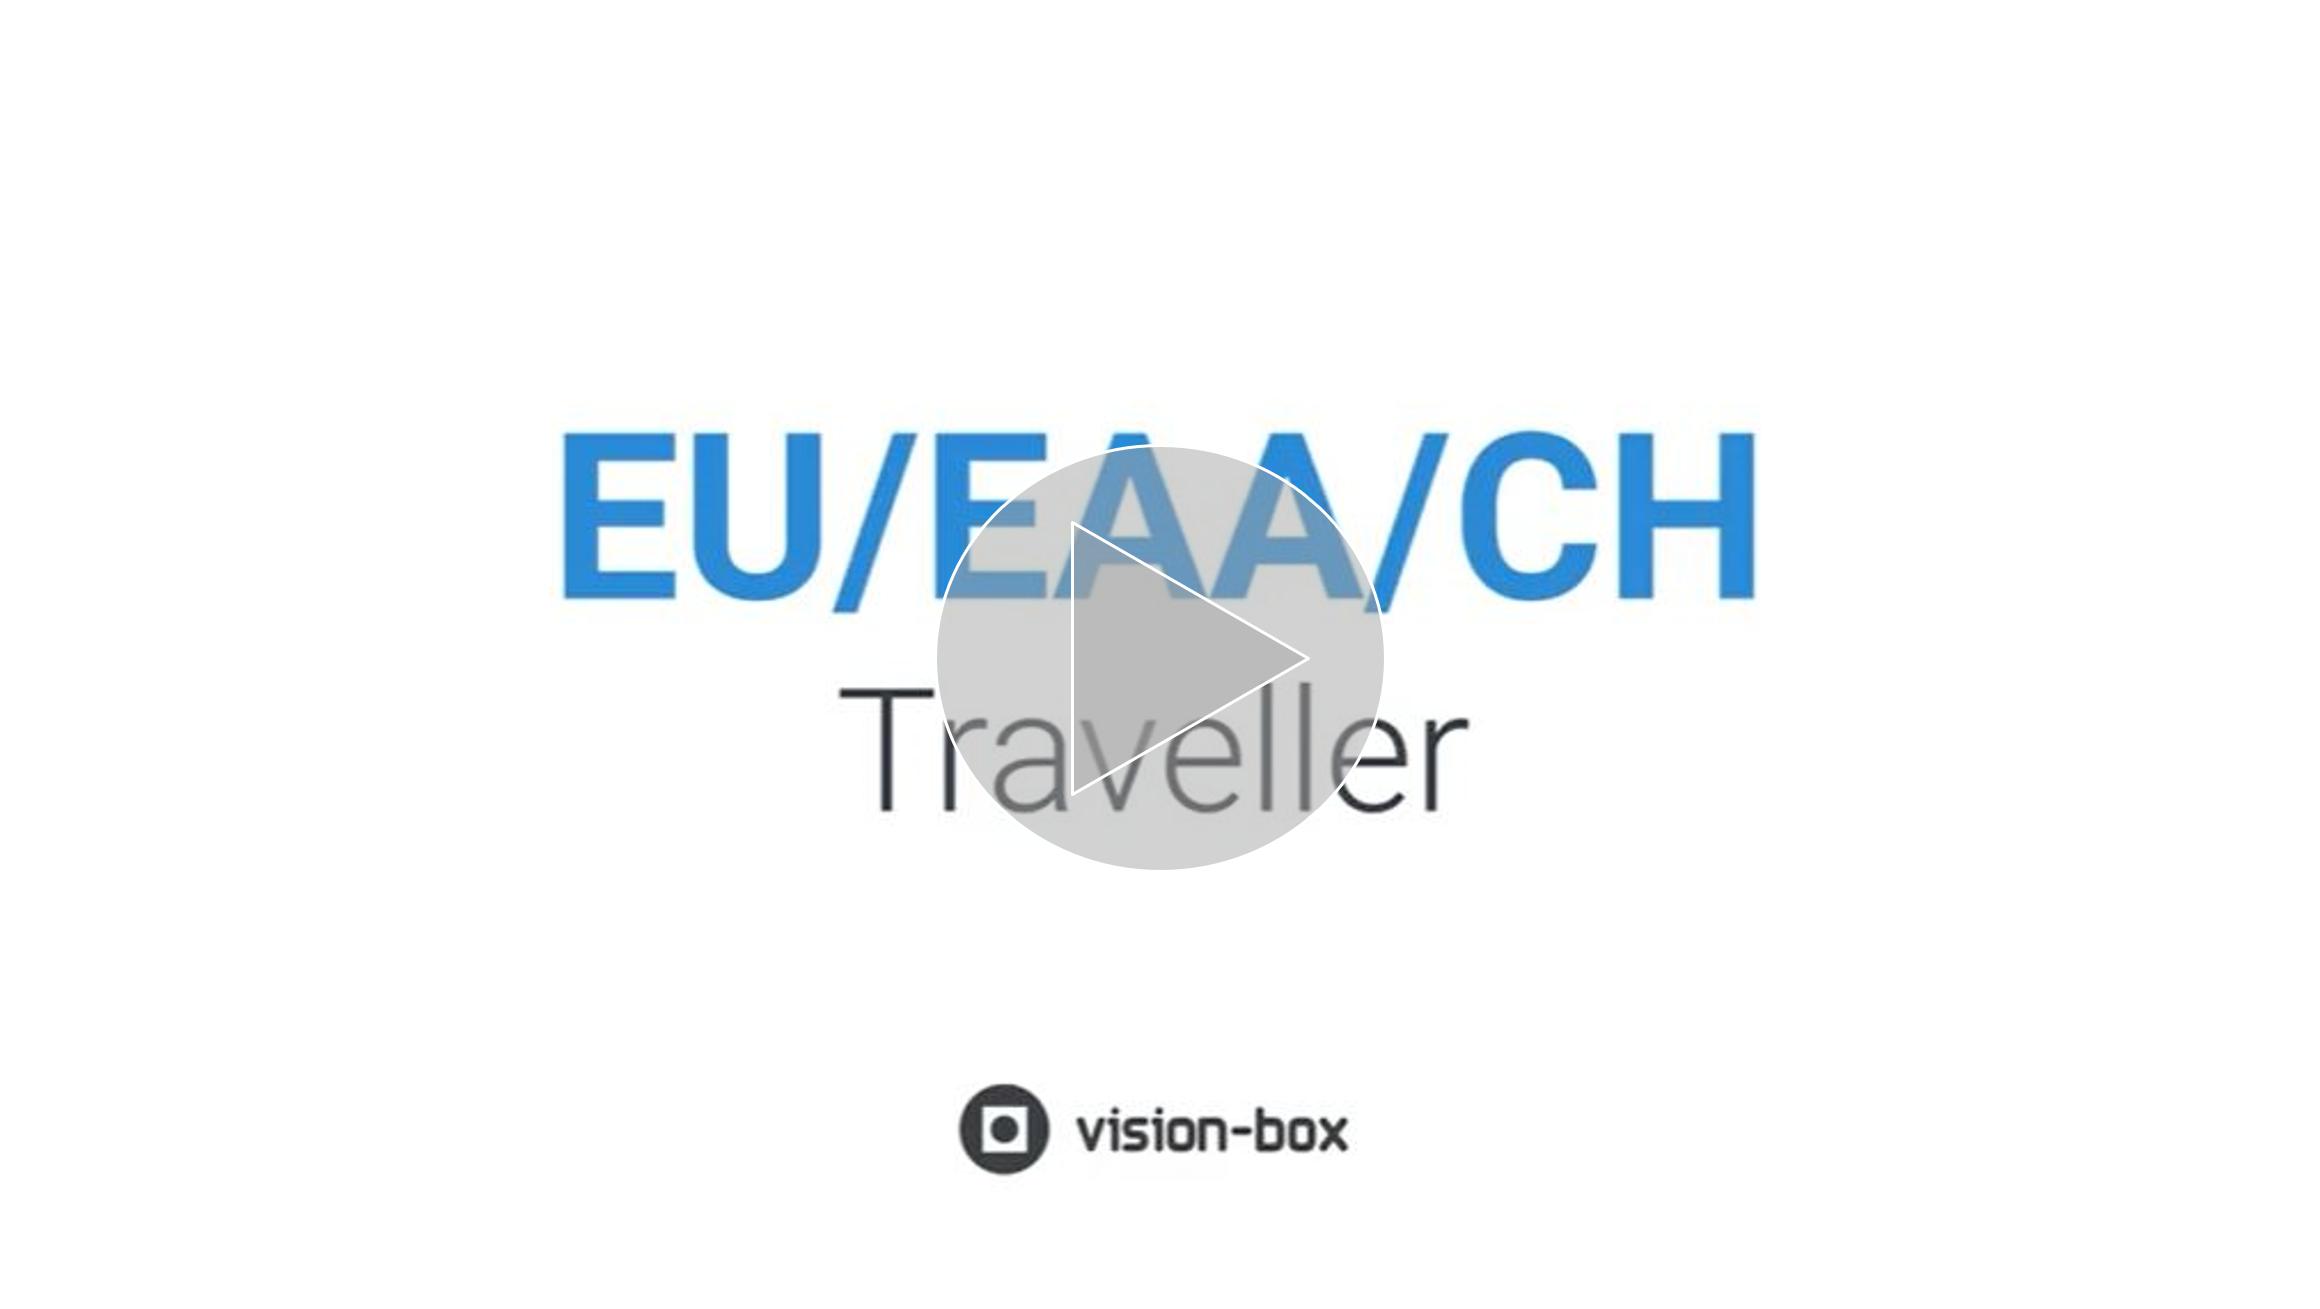 Vision-Box Smart Borders Solutions - EUEAACH Traveller Journey_video